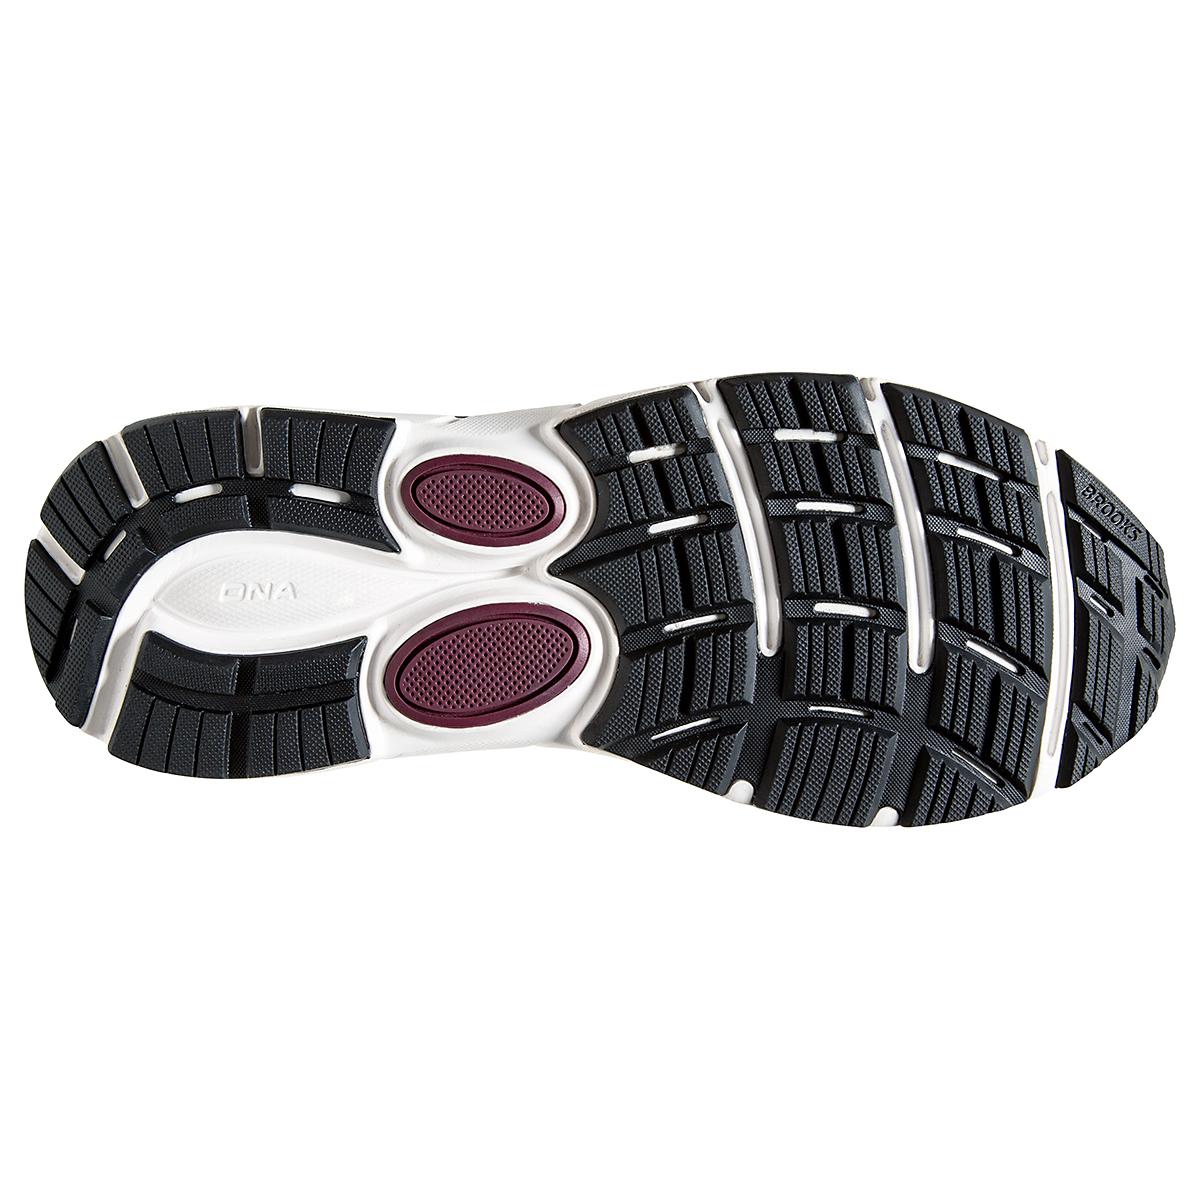 Men's Brooks Dyad 11 Running Shoe - Color: Blackened Pearl  - Size: 7 - Width: Regular, Blackened Pearl, large, image 4